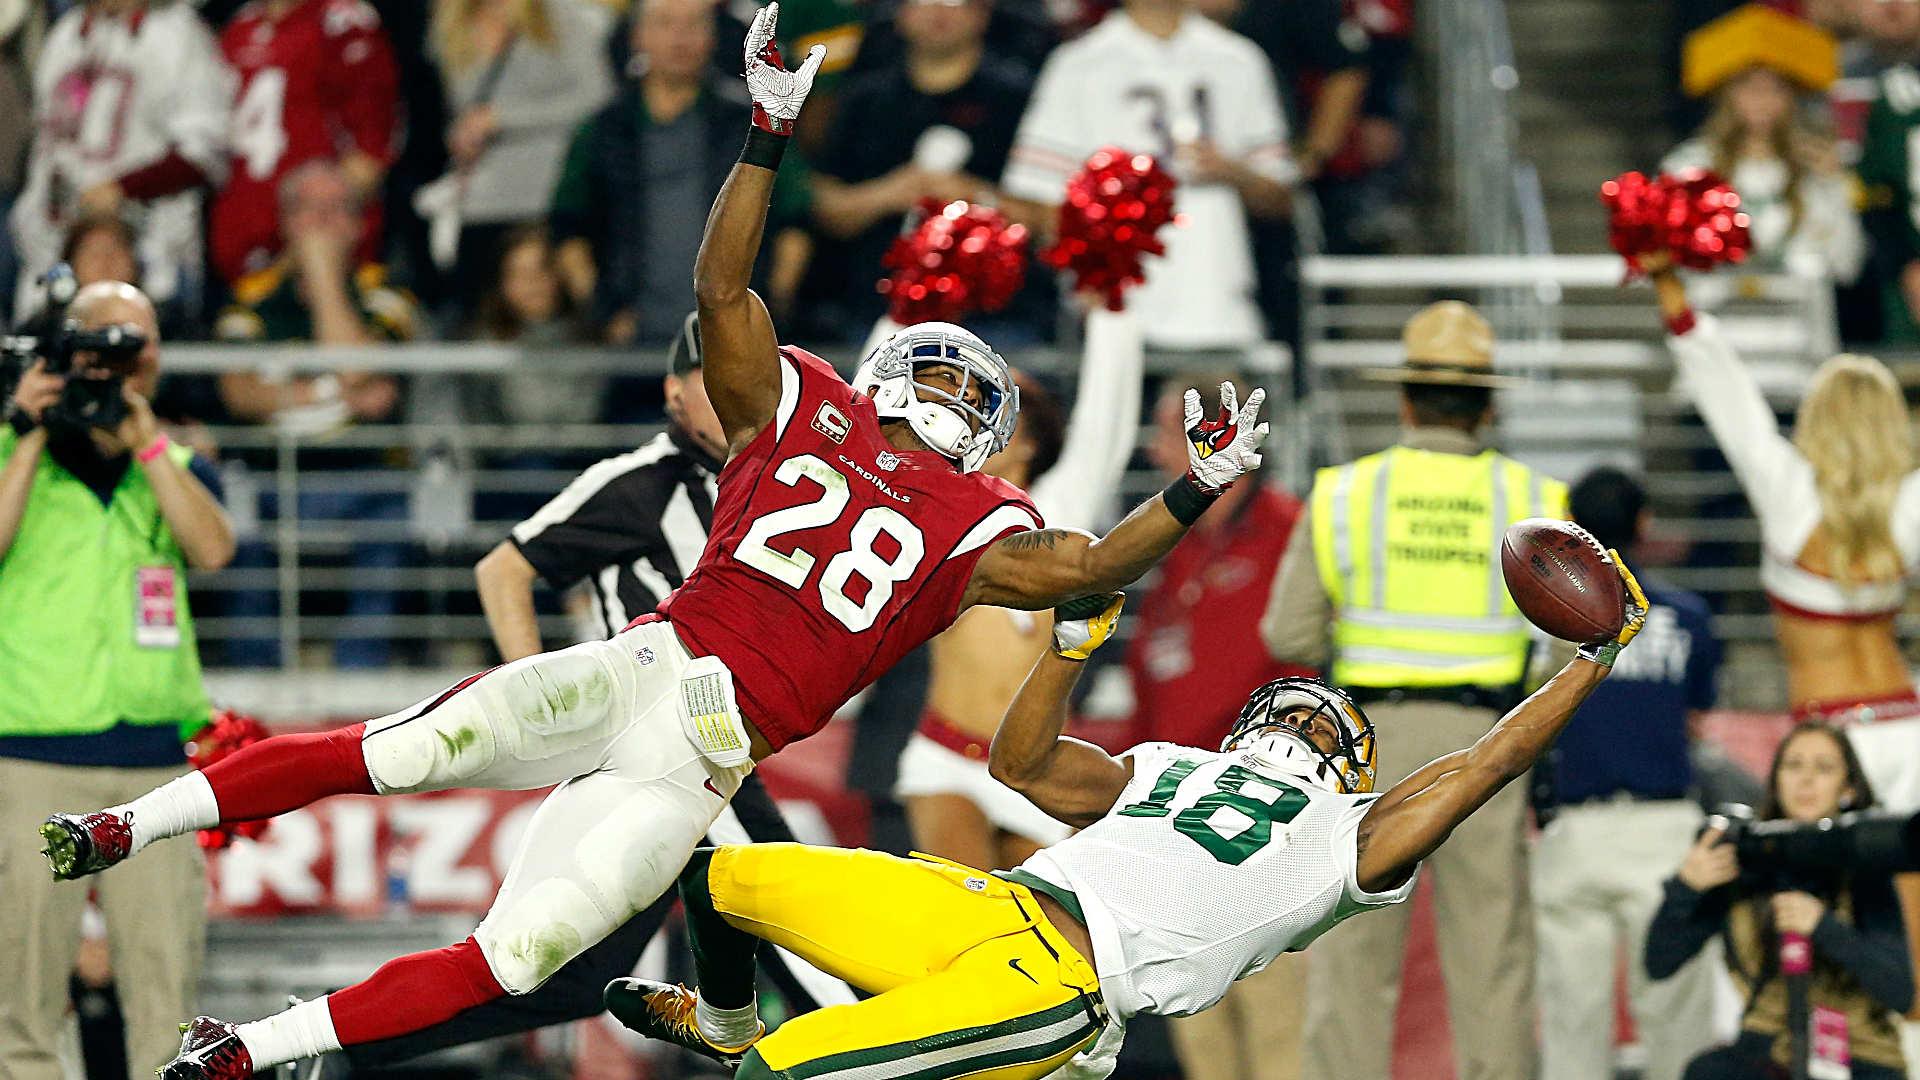 Packers lose Randall Cobb Micah Hyde trail Cardinals at halftime